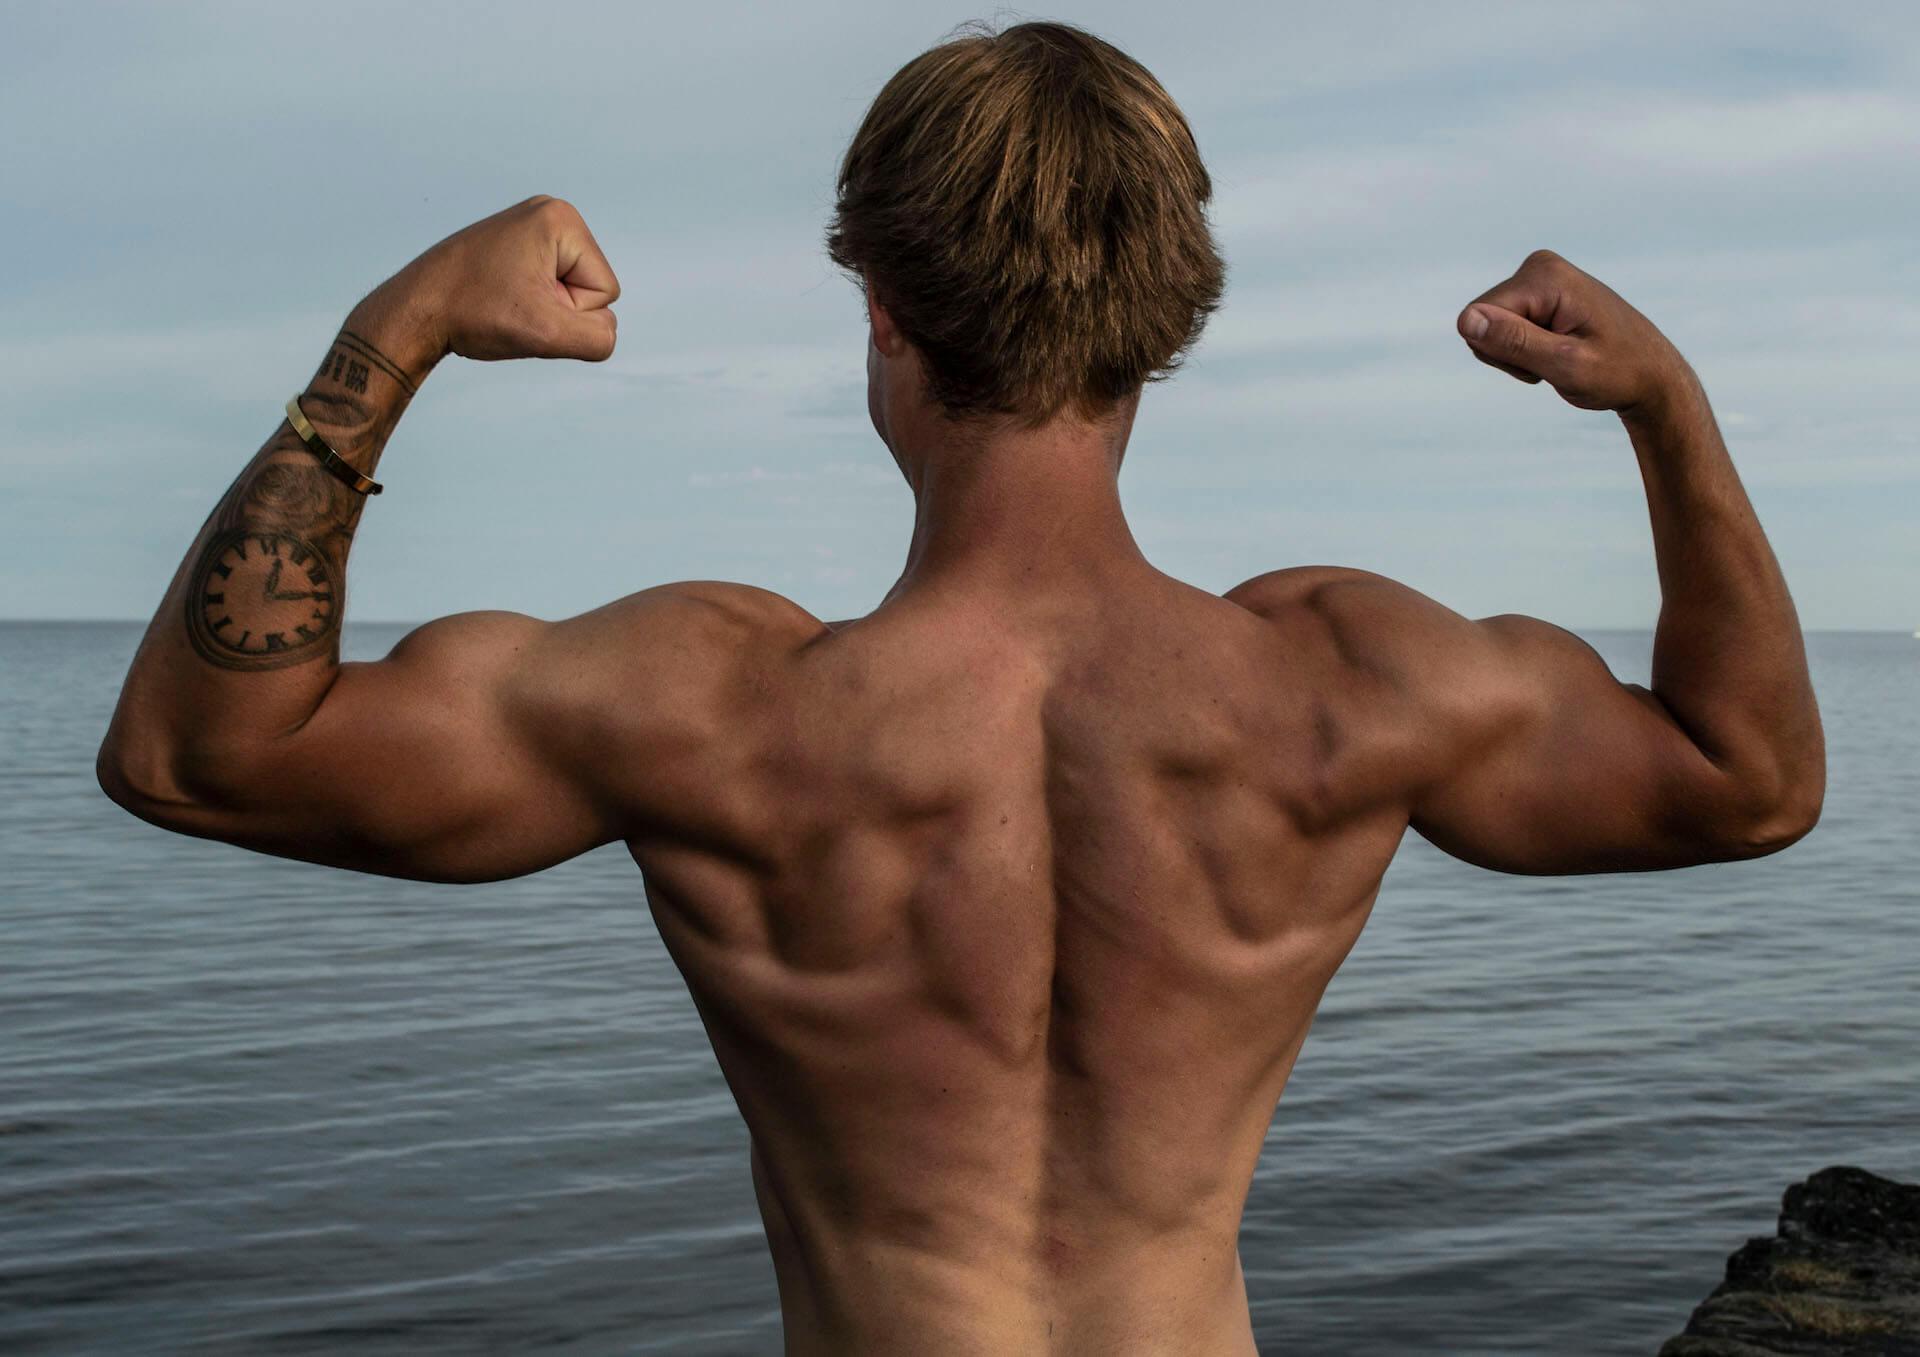 Keaton Ellis flexing his back in the 3 day split workout article.